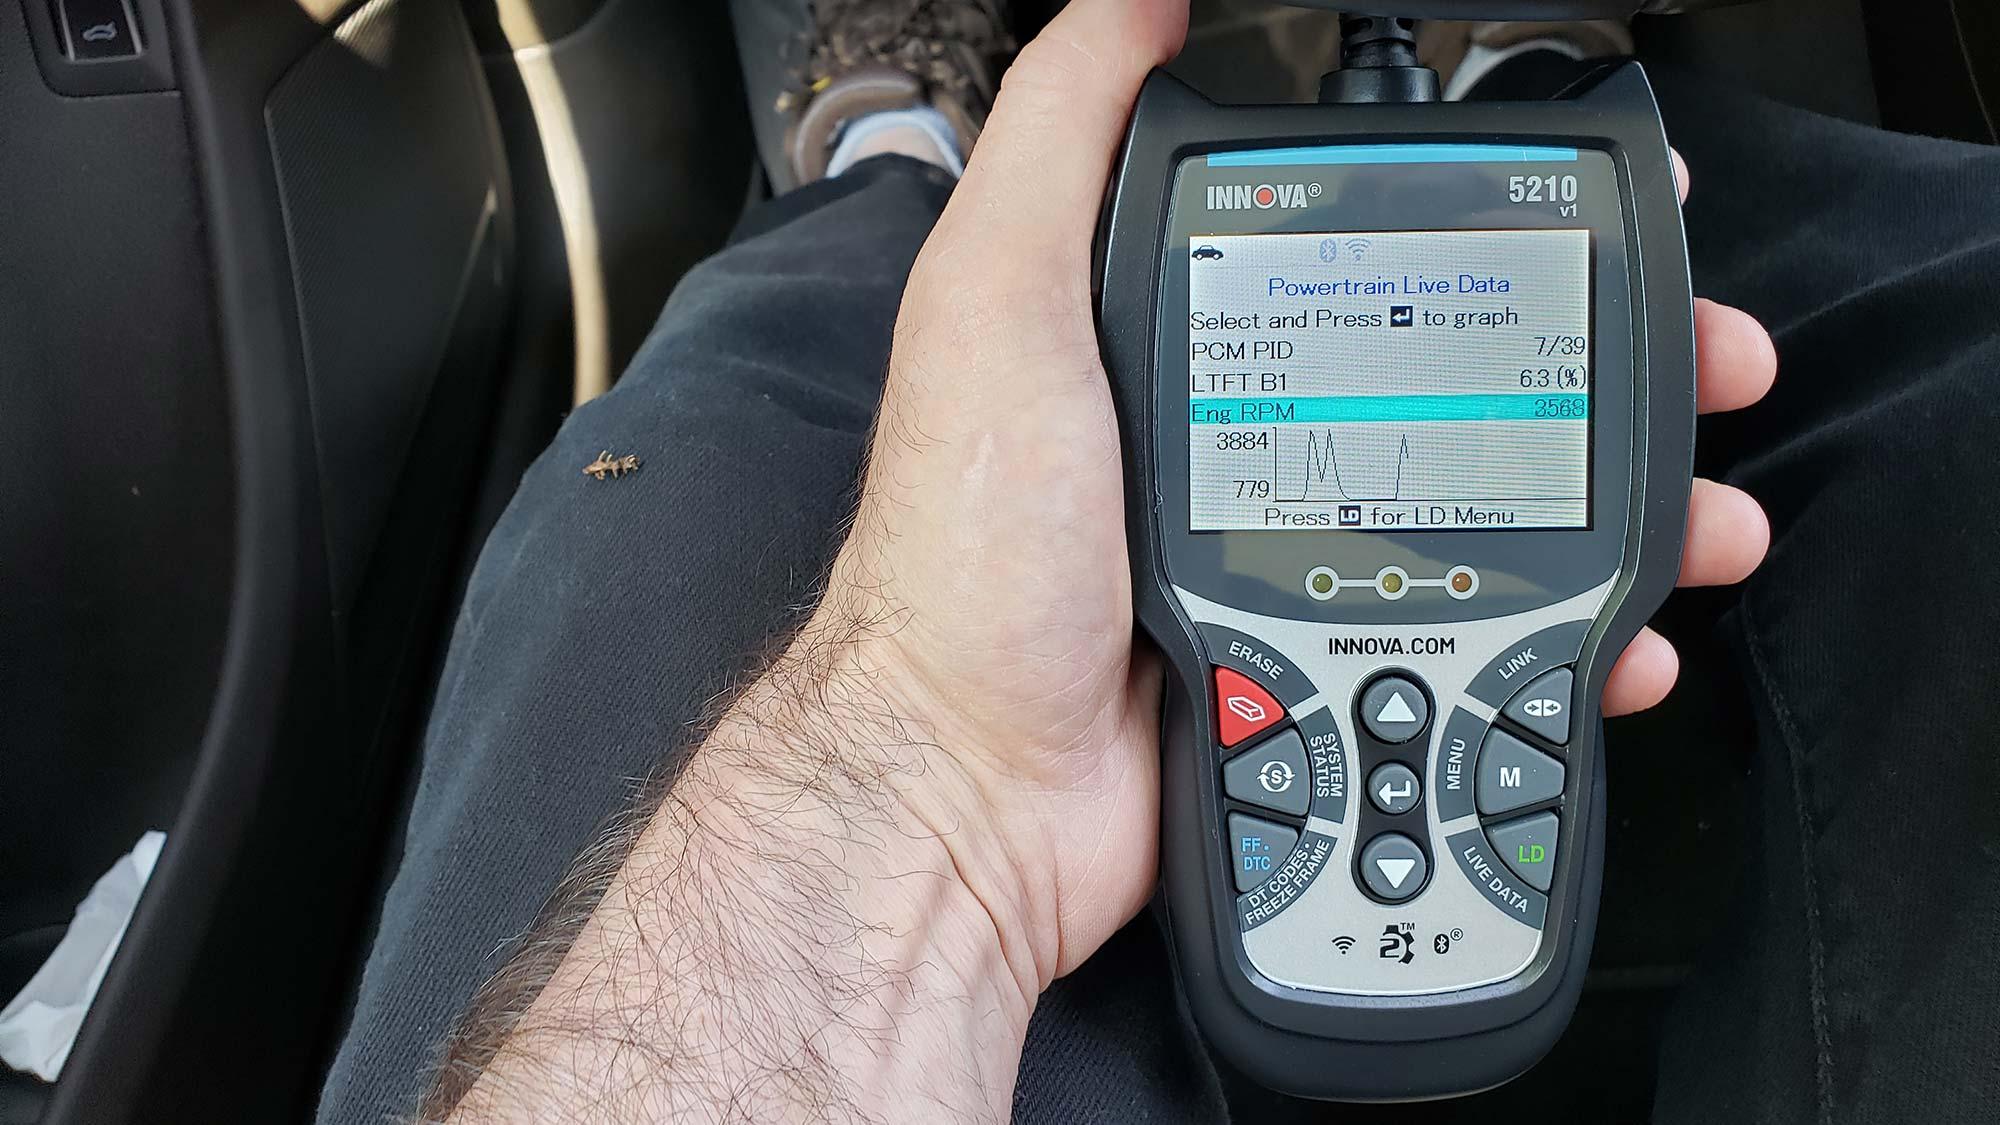 Best OBD2 scanners: Innova CarScan Pro 5210